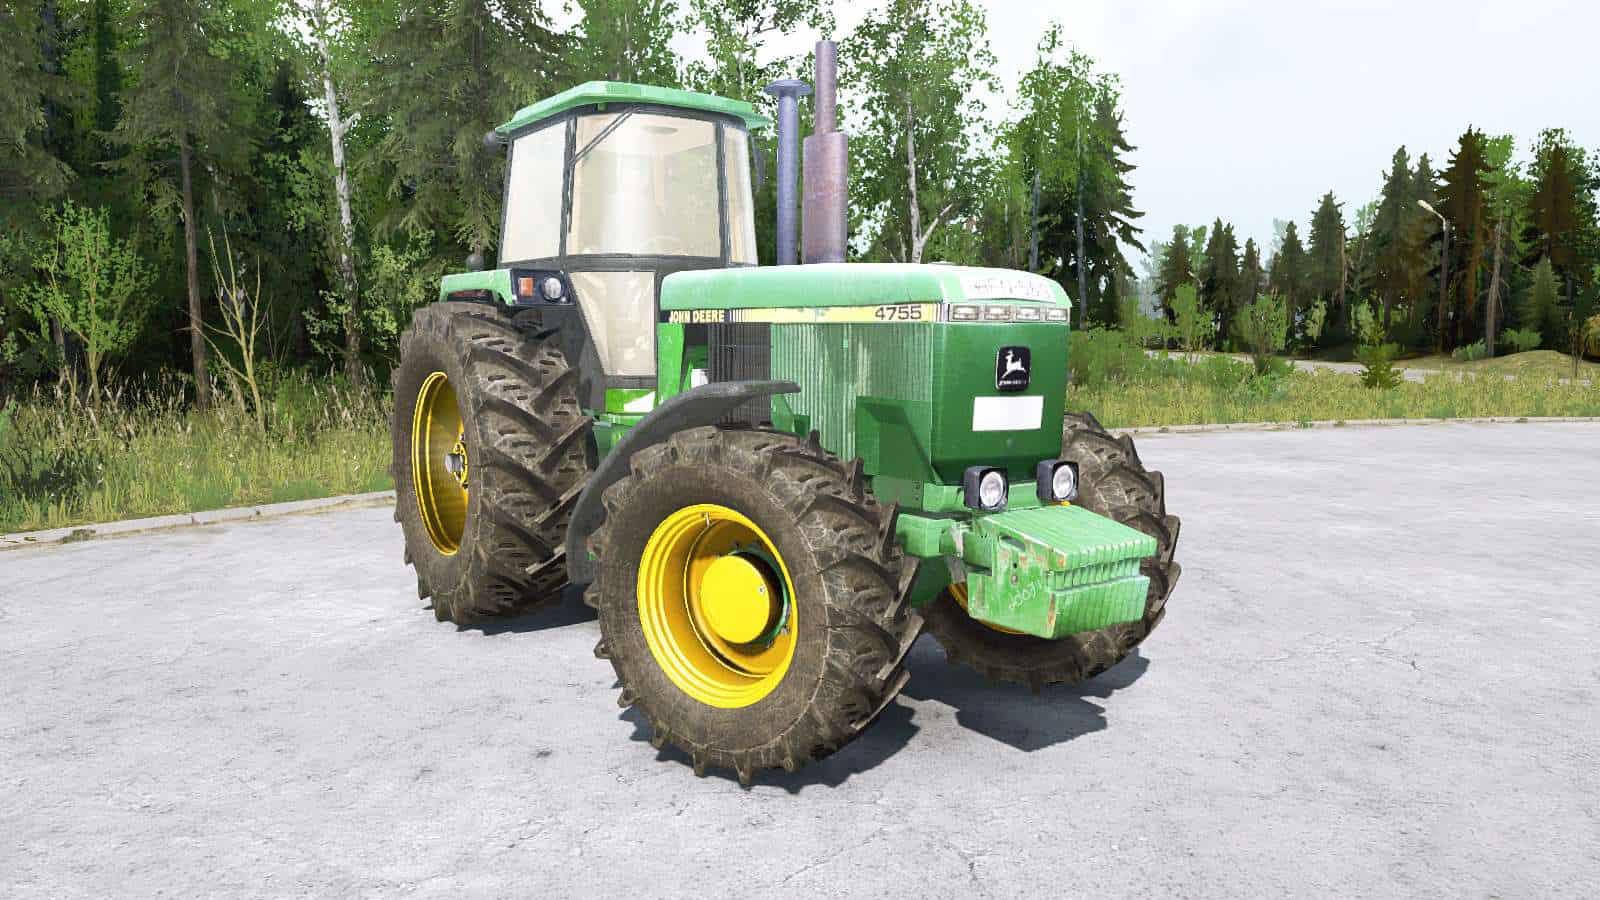 Spintires:Mudrunner - John Deere 4755 Tractor